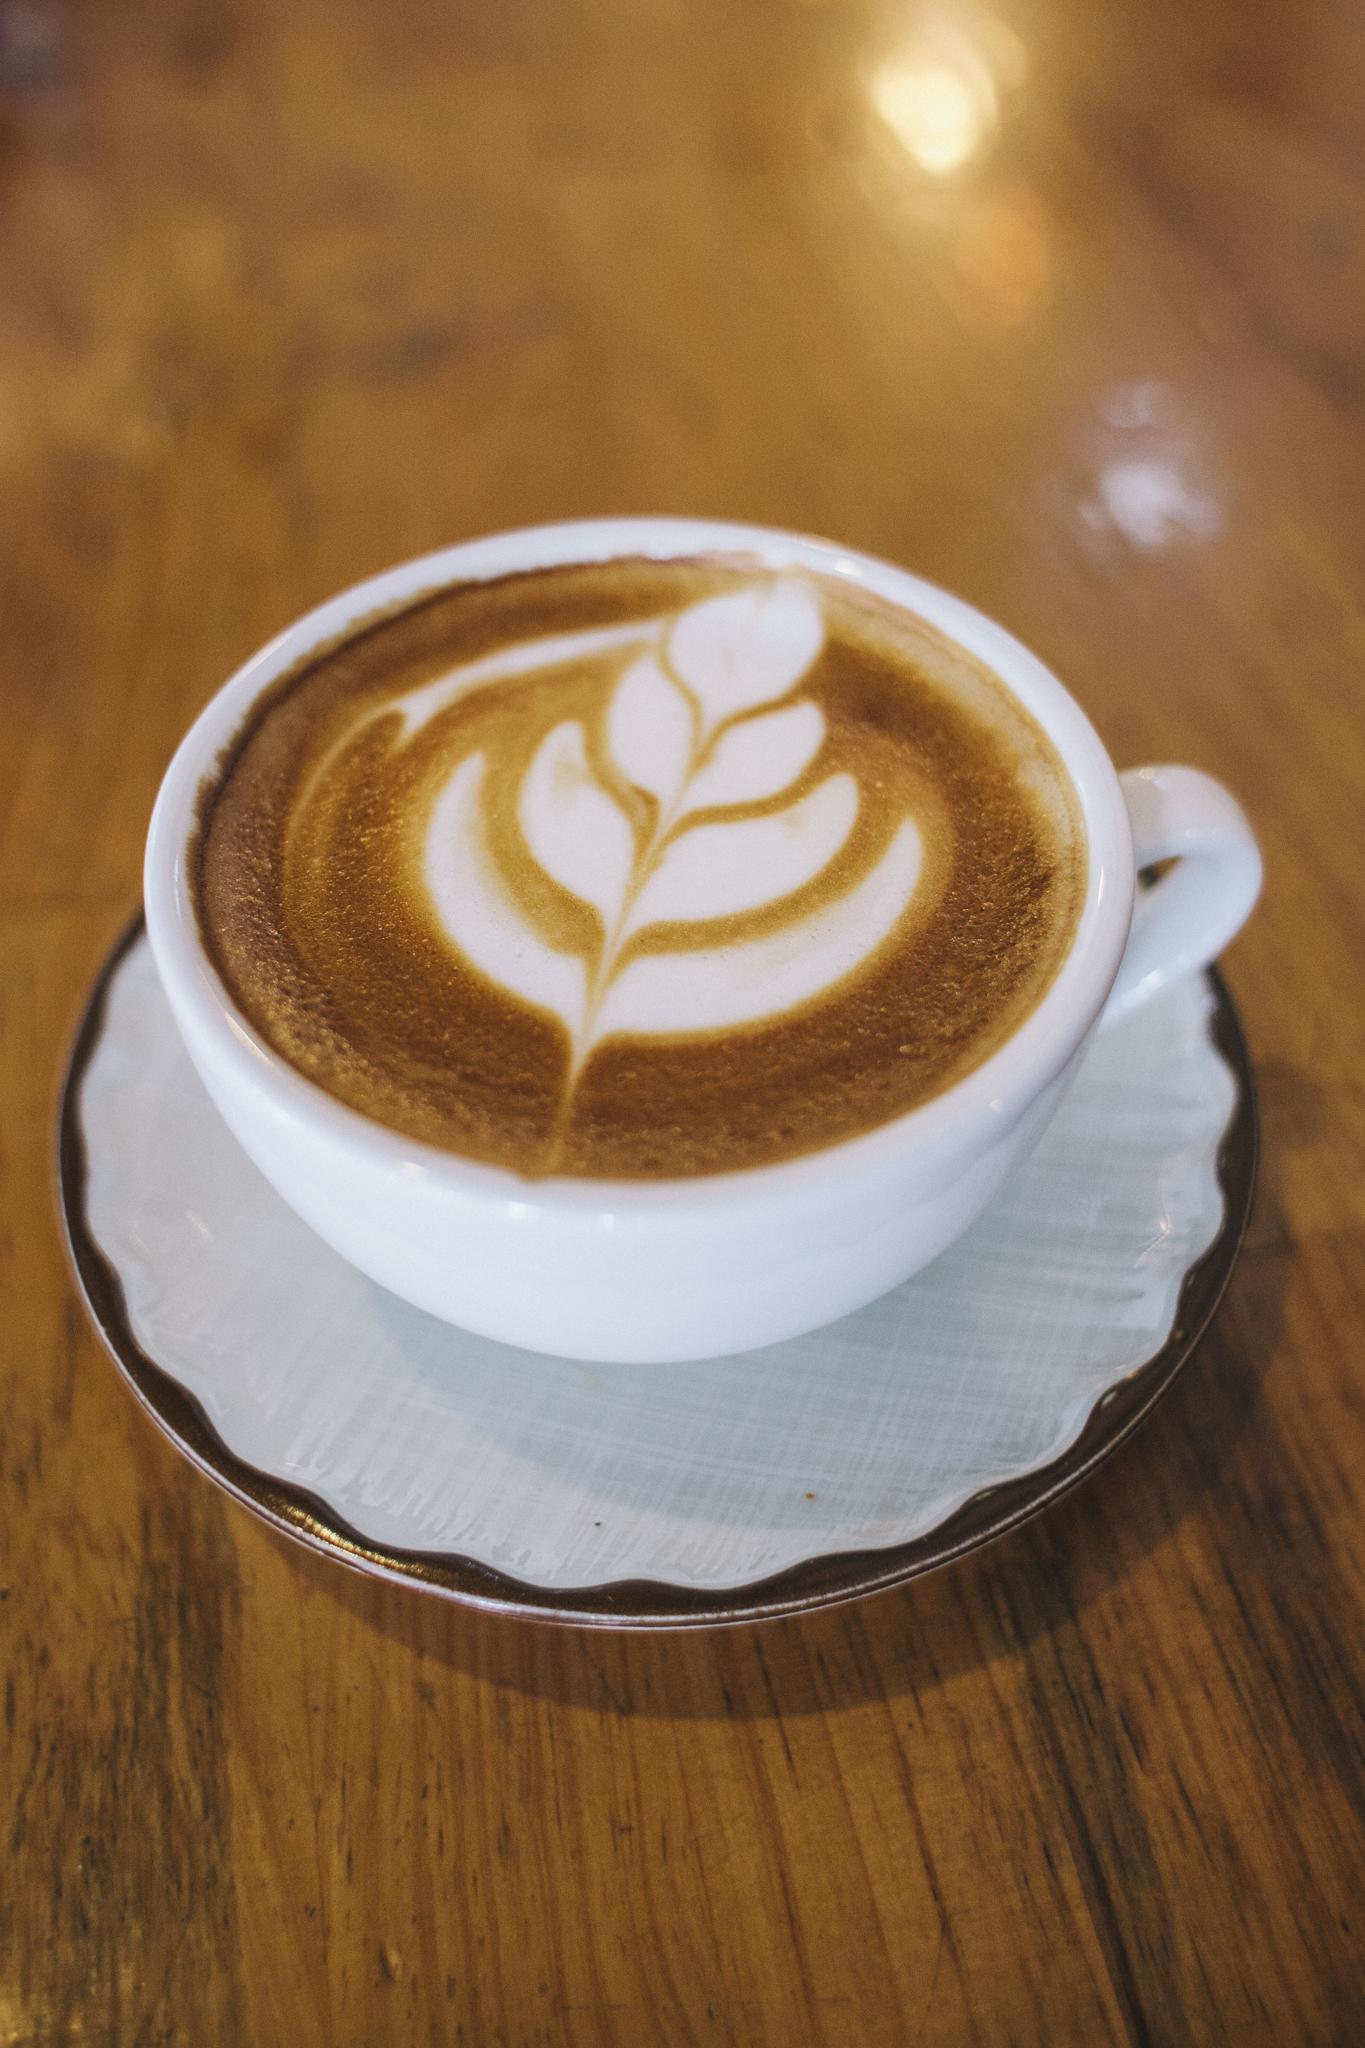 Sister_Srey_Siem_Reap_Cafe-13.jpg